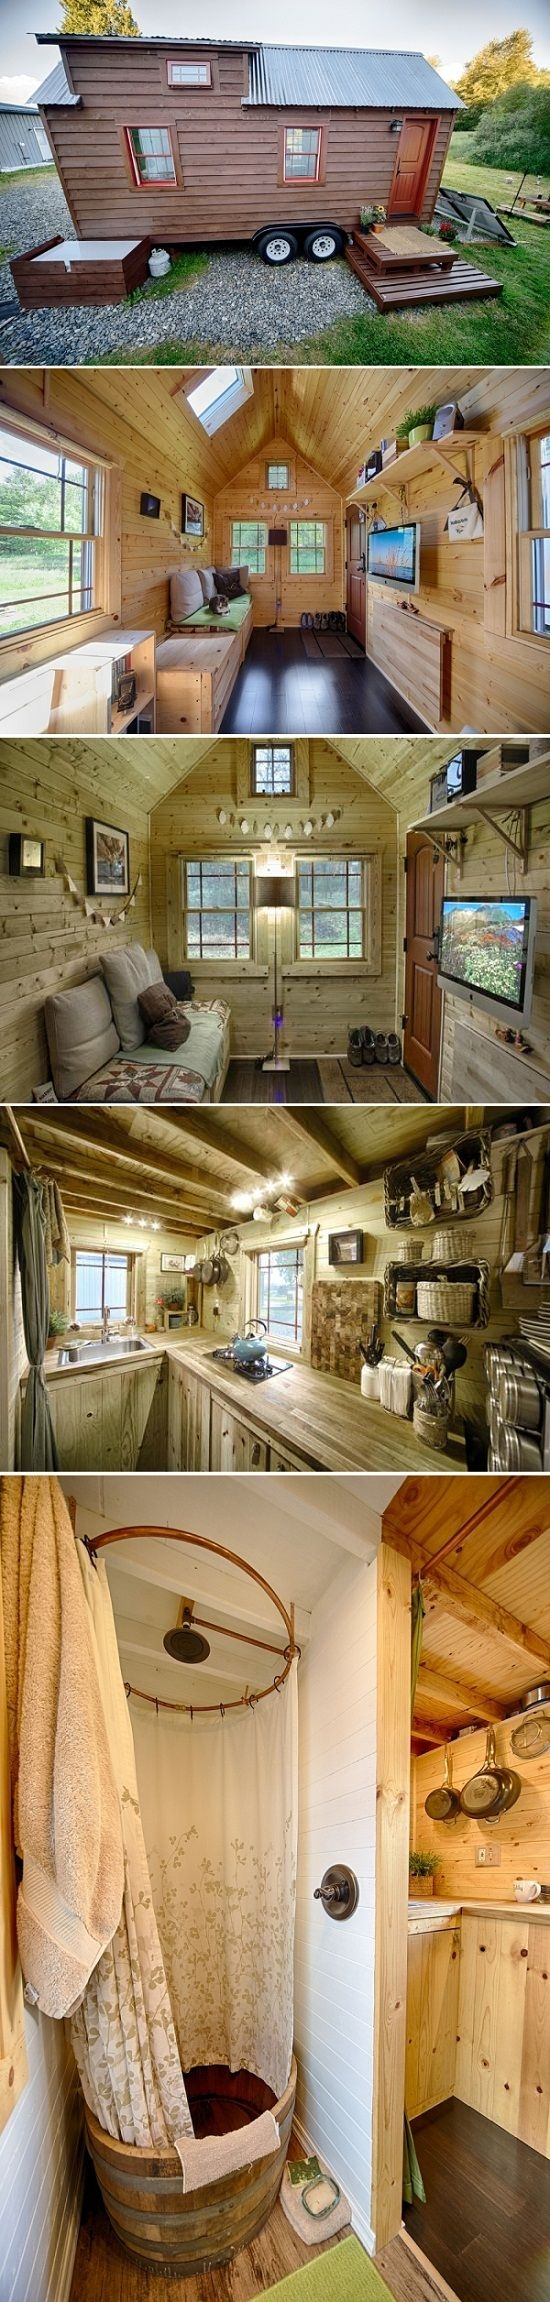 The Tiny Tack House By Pearfortheteacher House Tiny